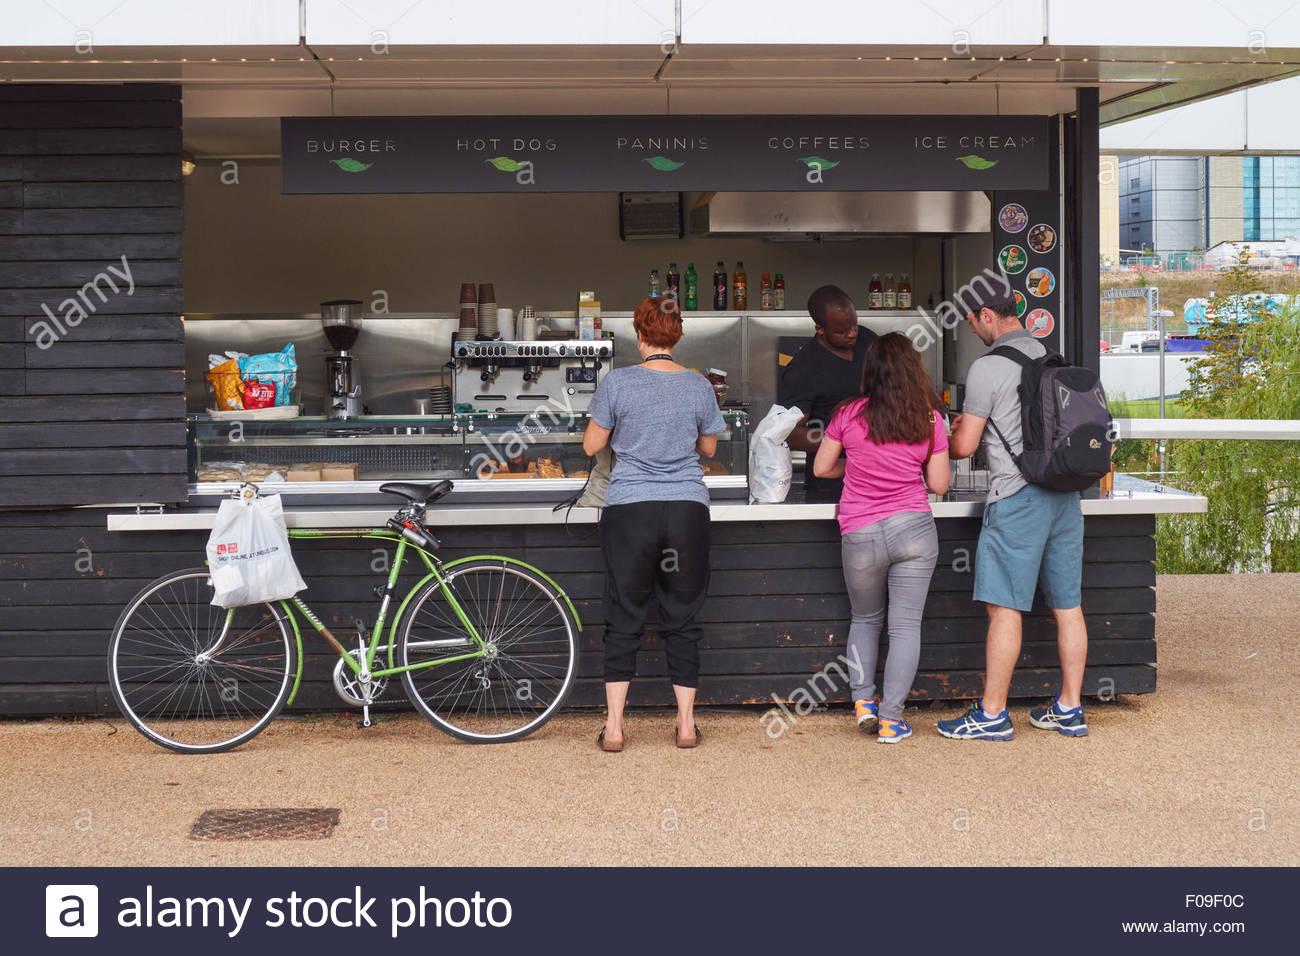 Cafe Take Away At Queen Elizabeth Olympic Park London England United Kingdom UK